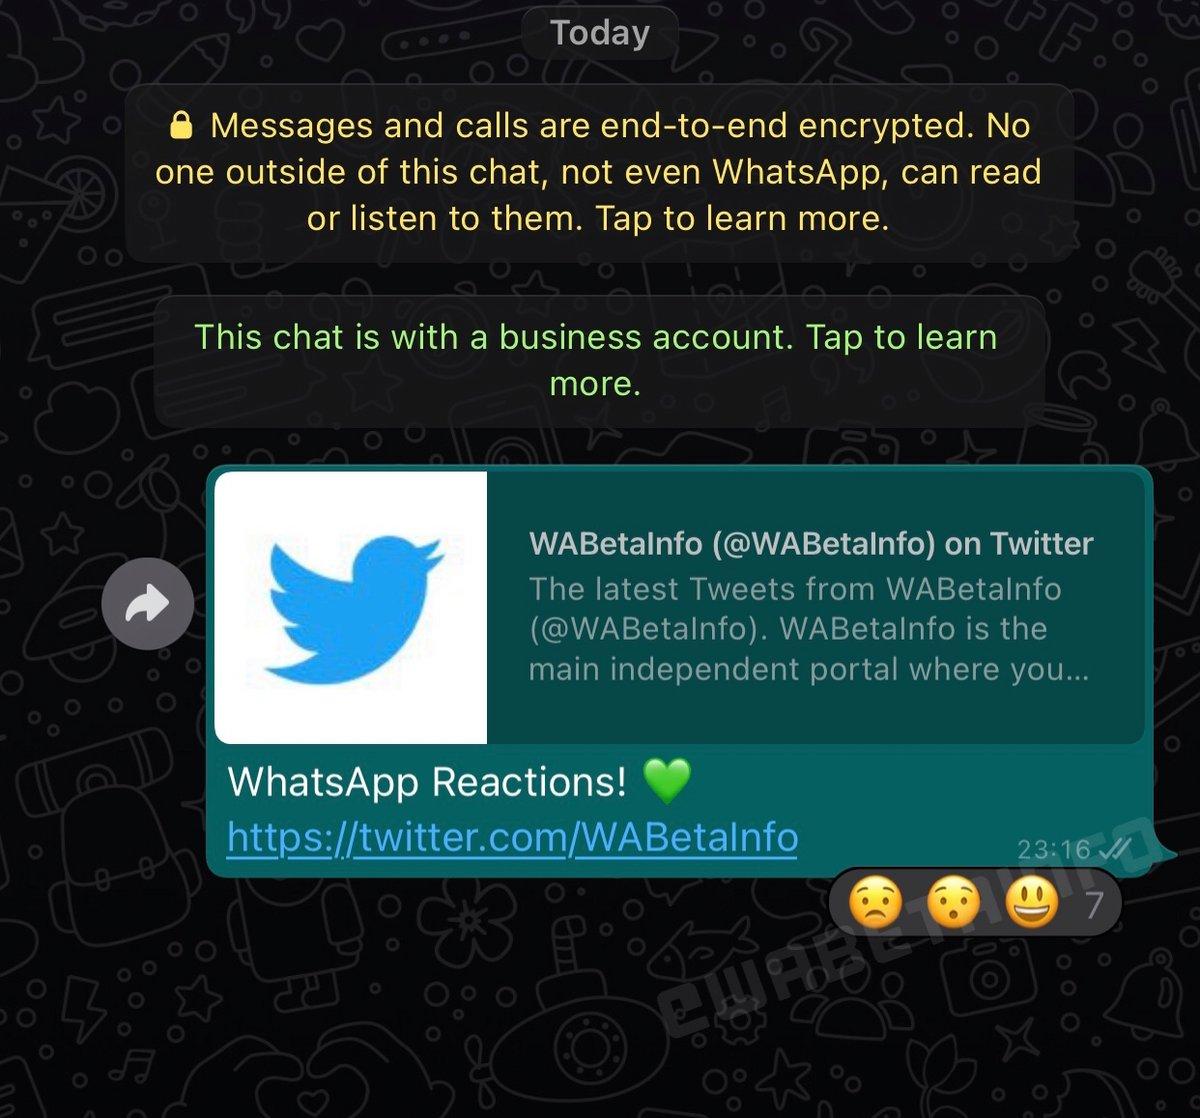 WhatsApp réaction messages © ©WABetaInfo